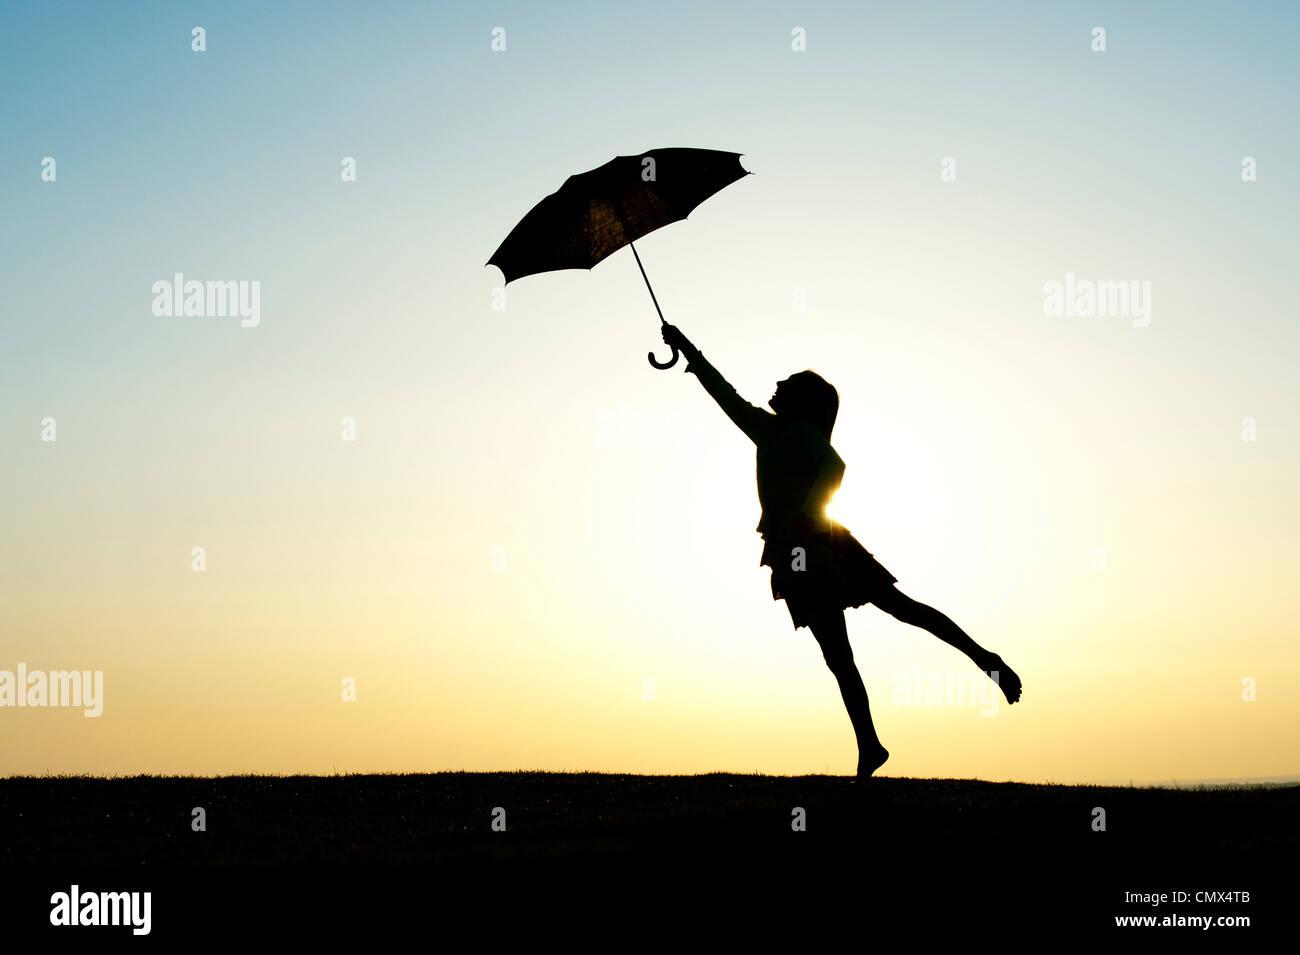 Joven saltando con un paraguas al atardecer. Silueta Imagen De Stock